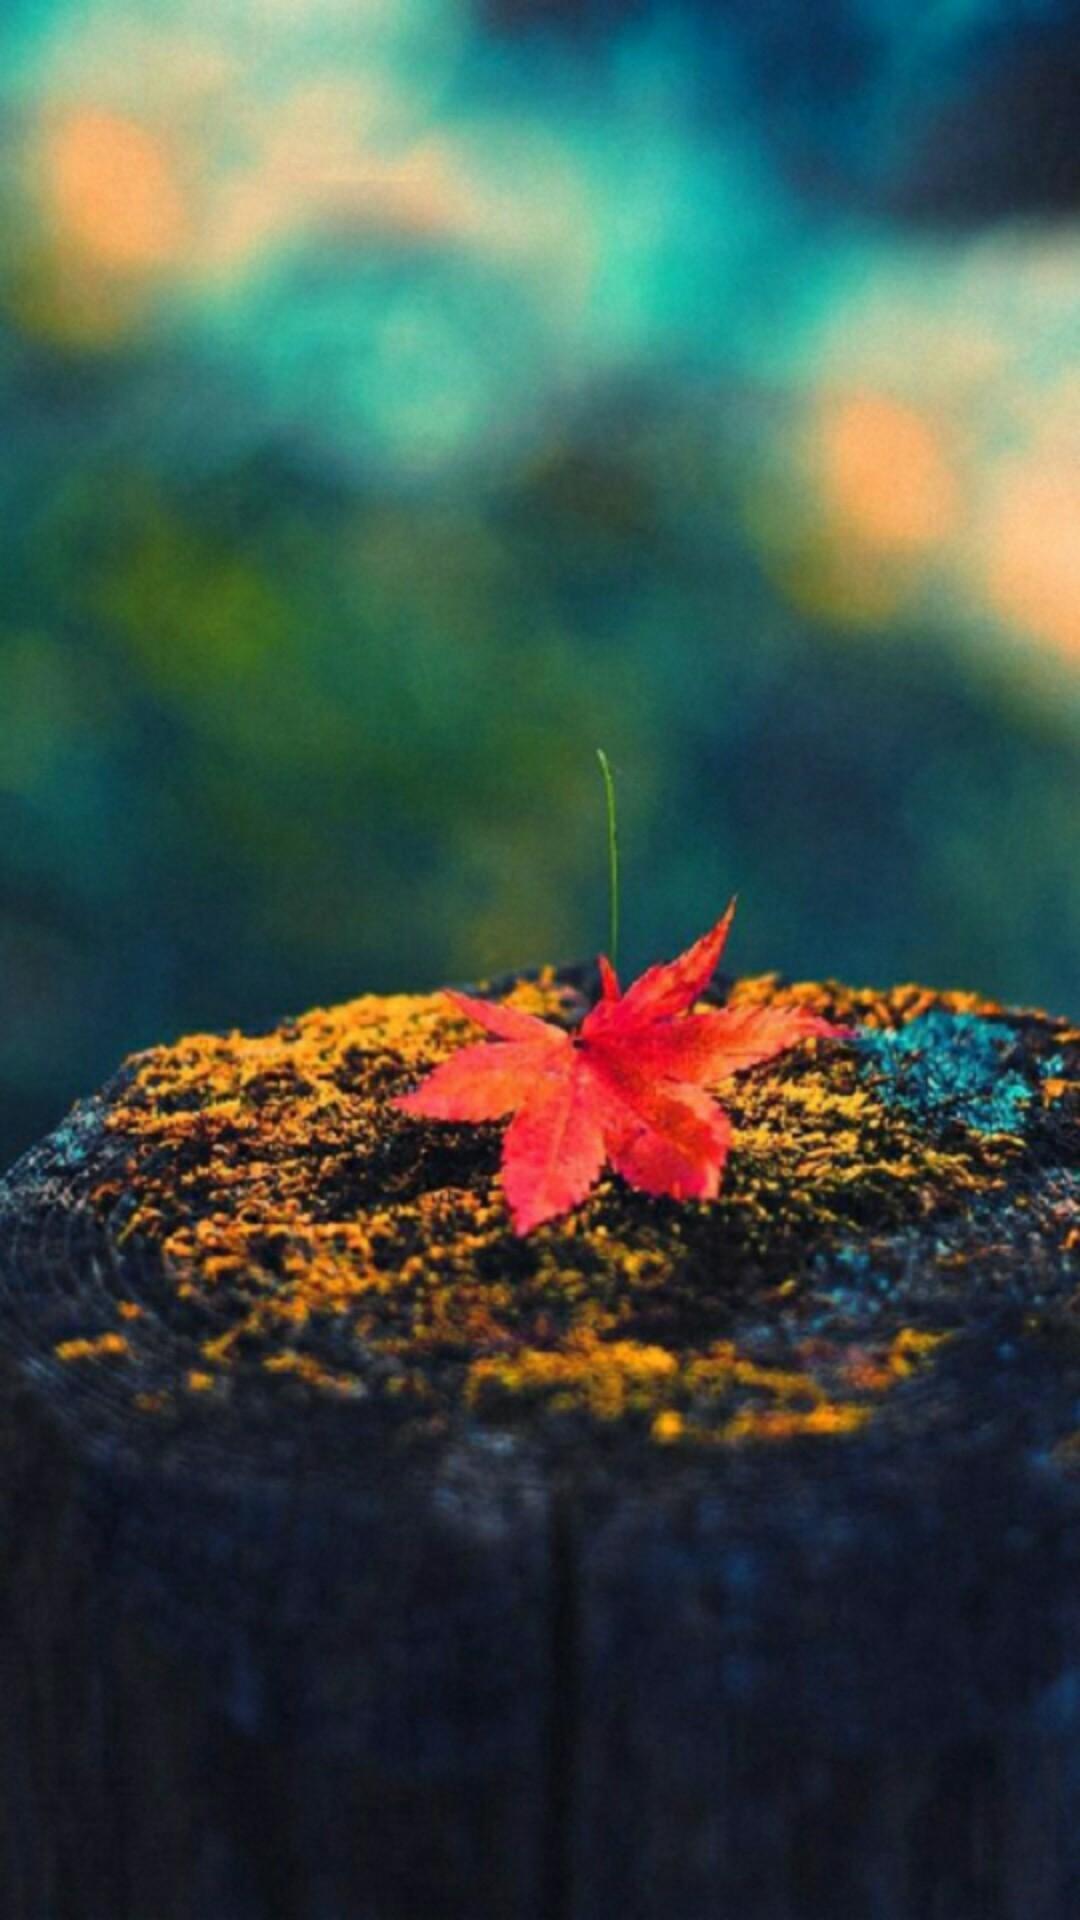 Maple leaf cellphone wallpaper lock screen, Fall, Autumn leaves, moss, tree  stump